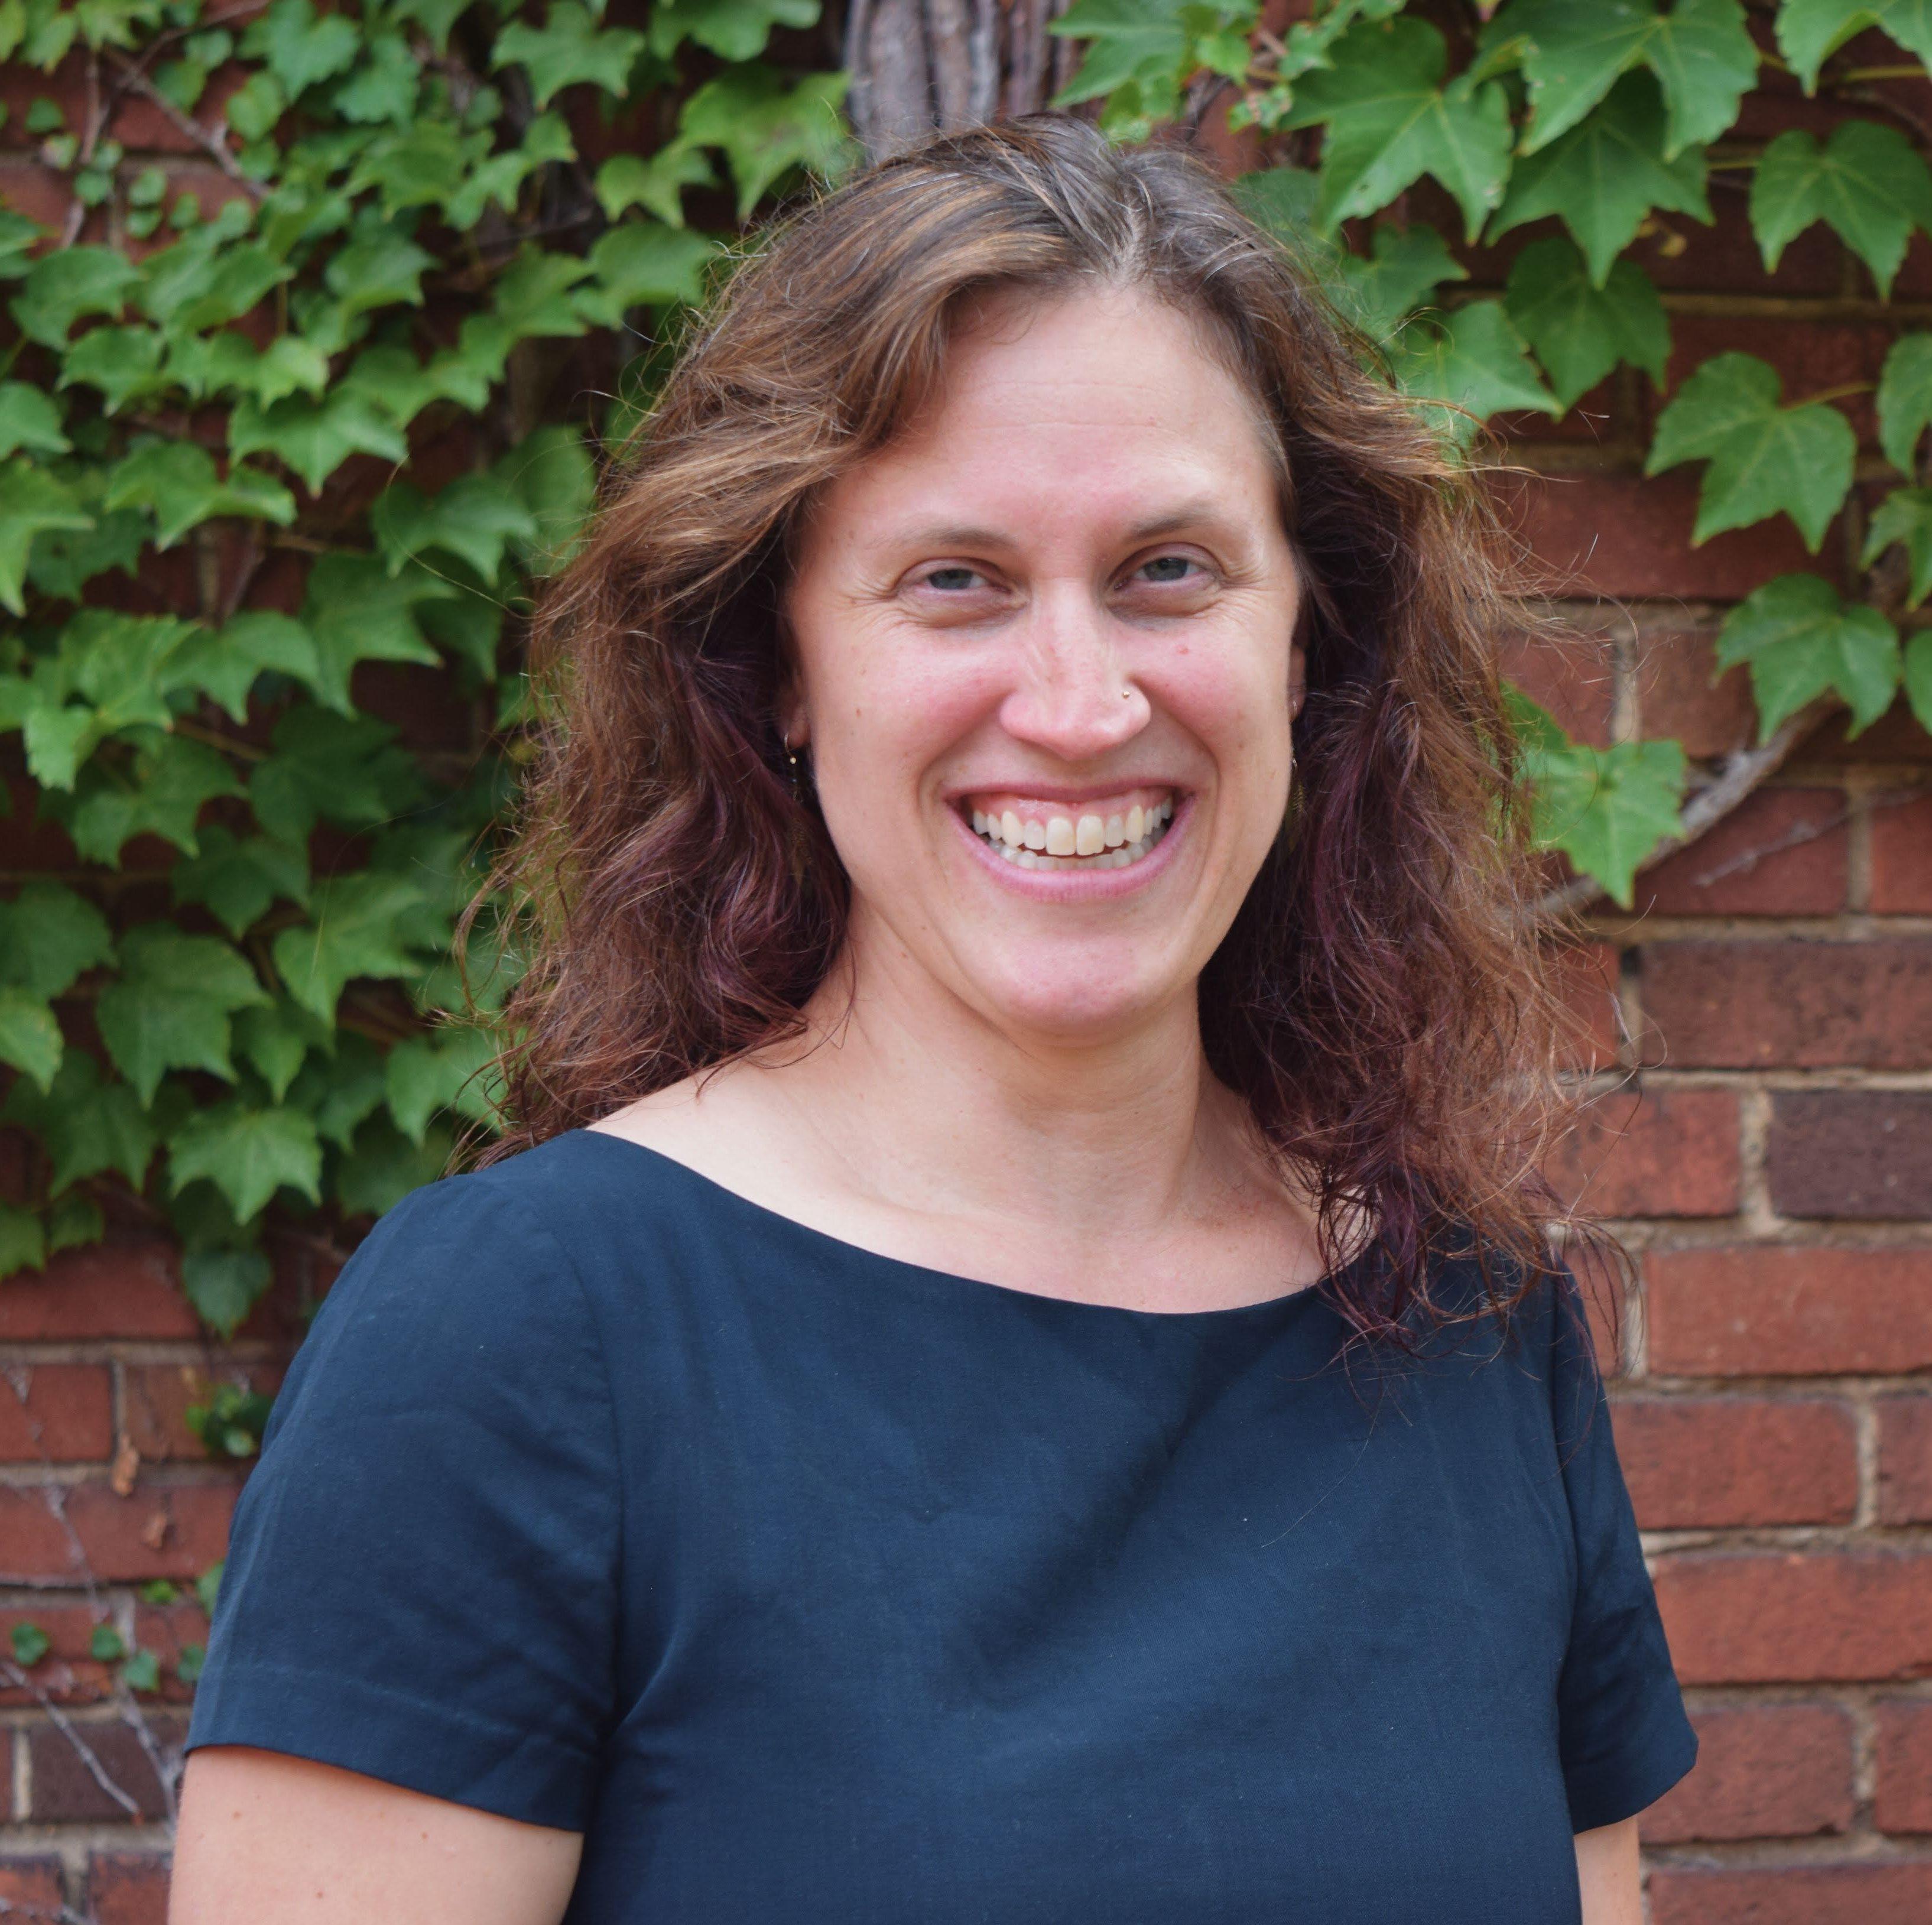 Adrienne Kuckler Eldridge